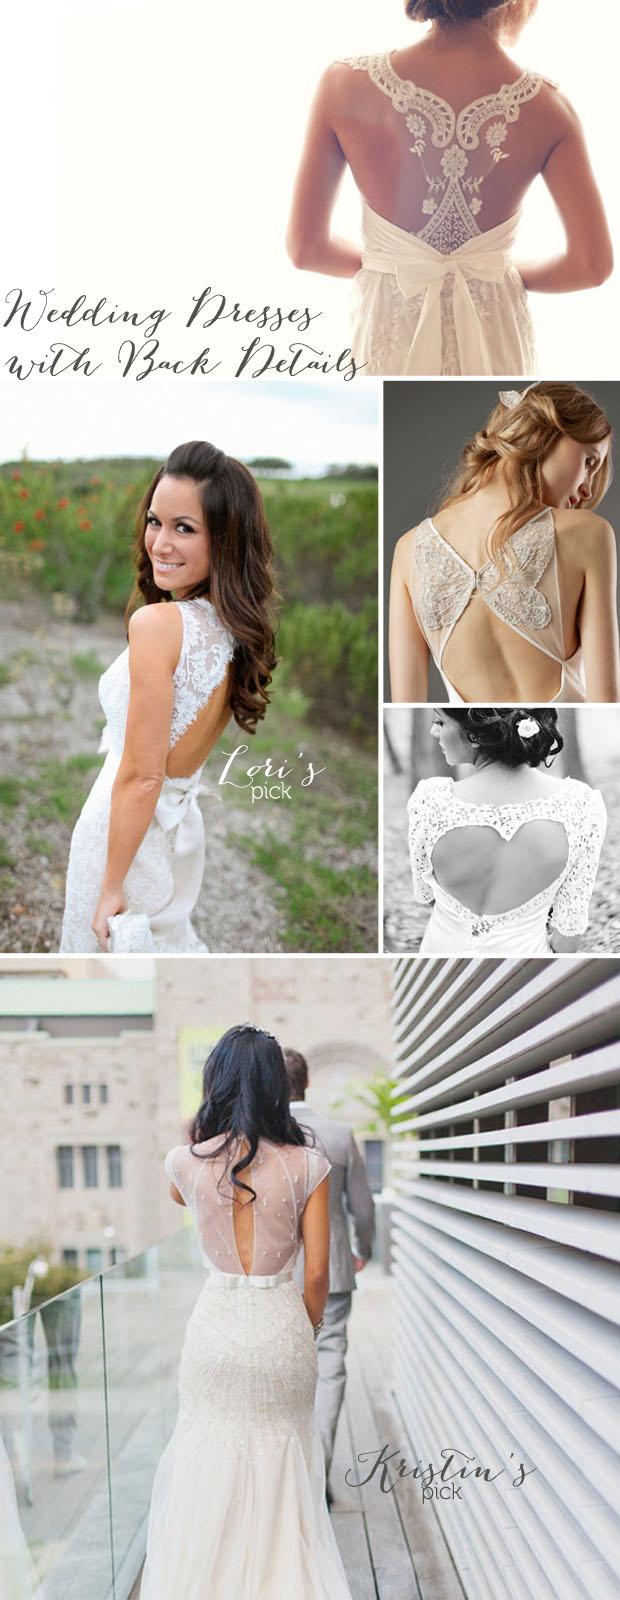 back cut outs, low backs, heart cut out, peepholes, back details on wedding dresses